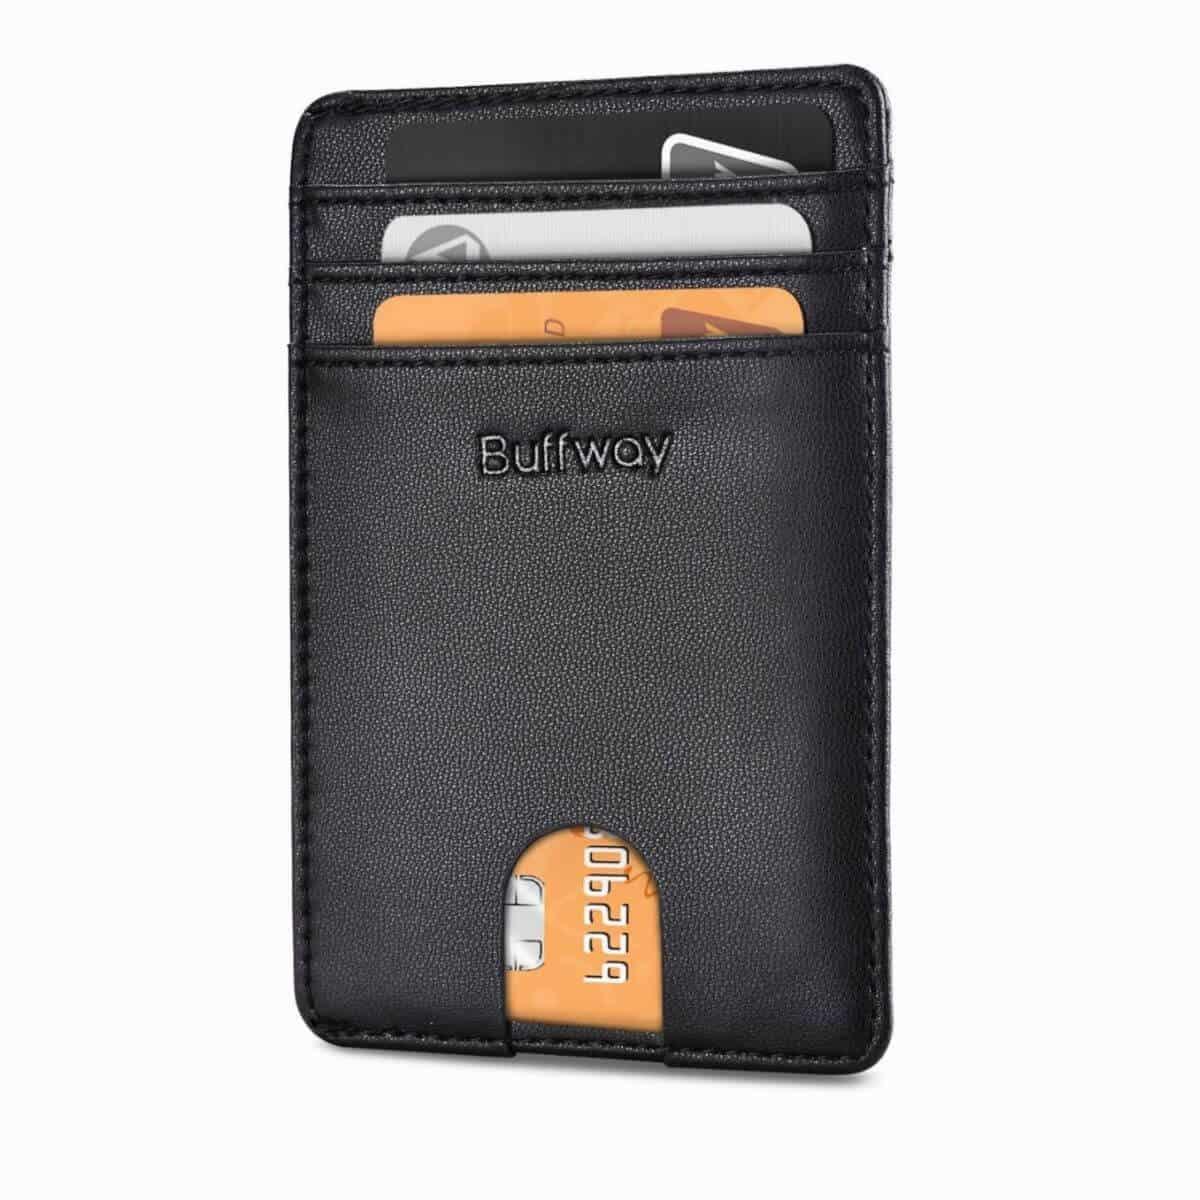 Buffway RFID blocking wallet.